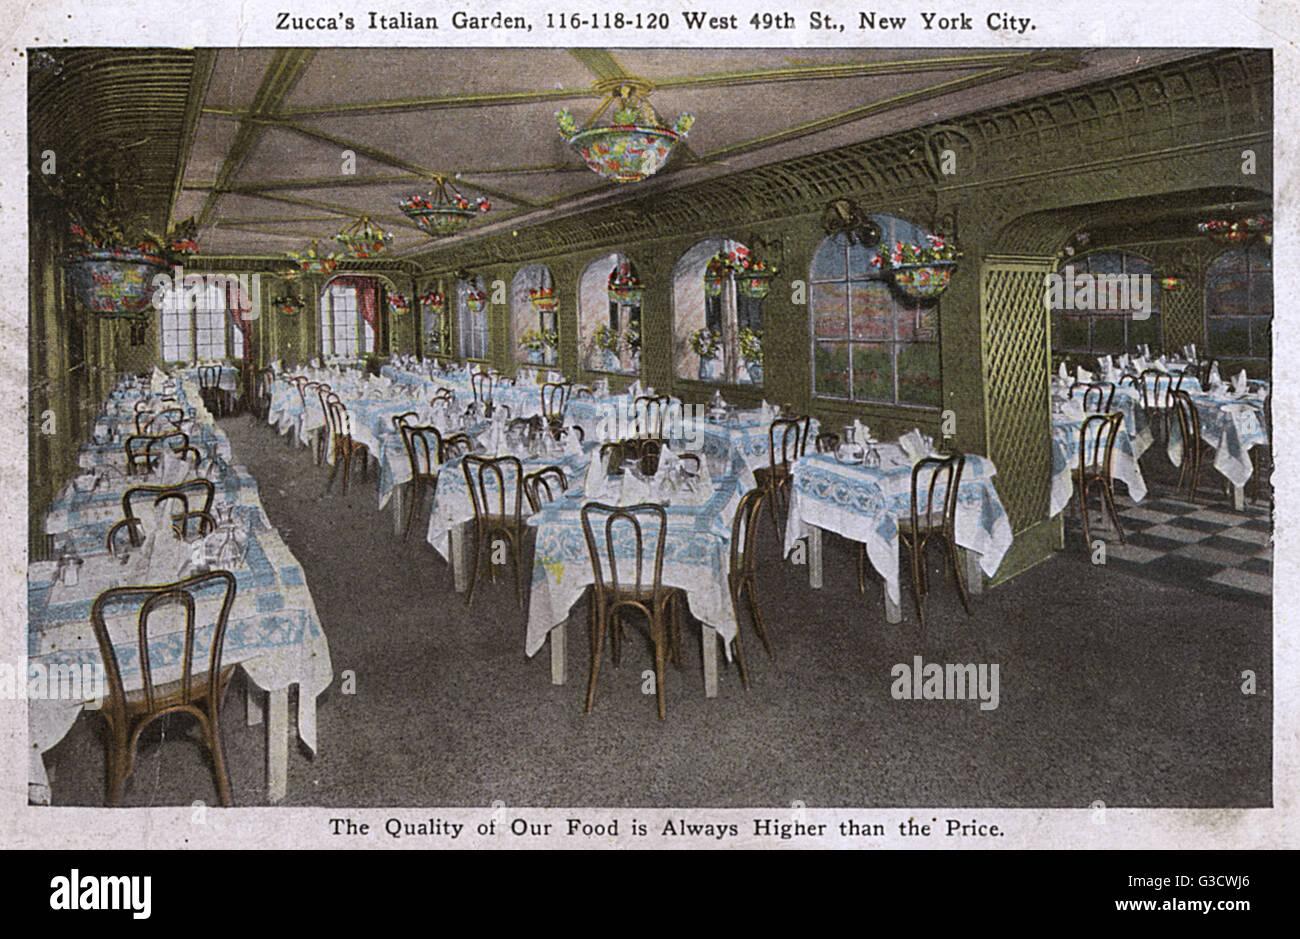 zucca s italian garden west 49th street new york city usa stock